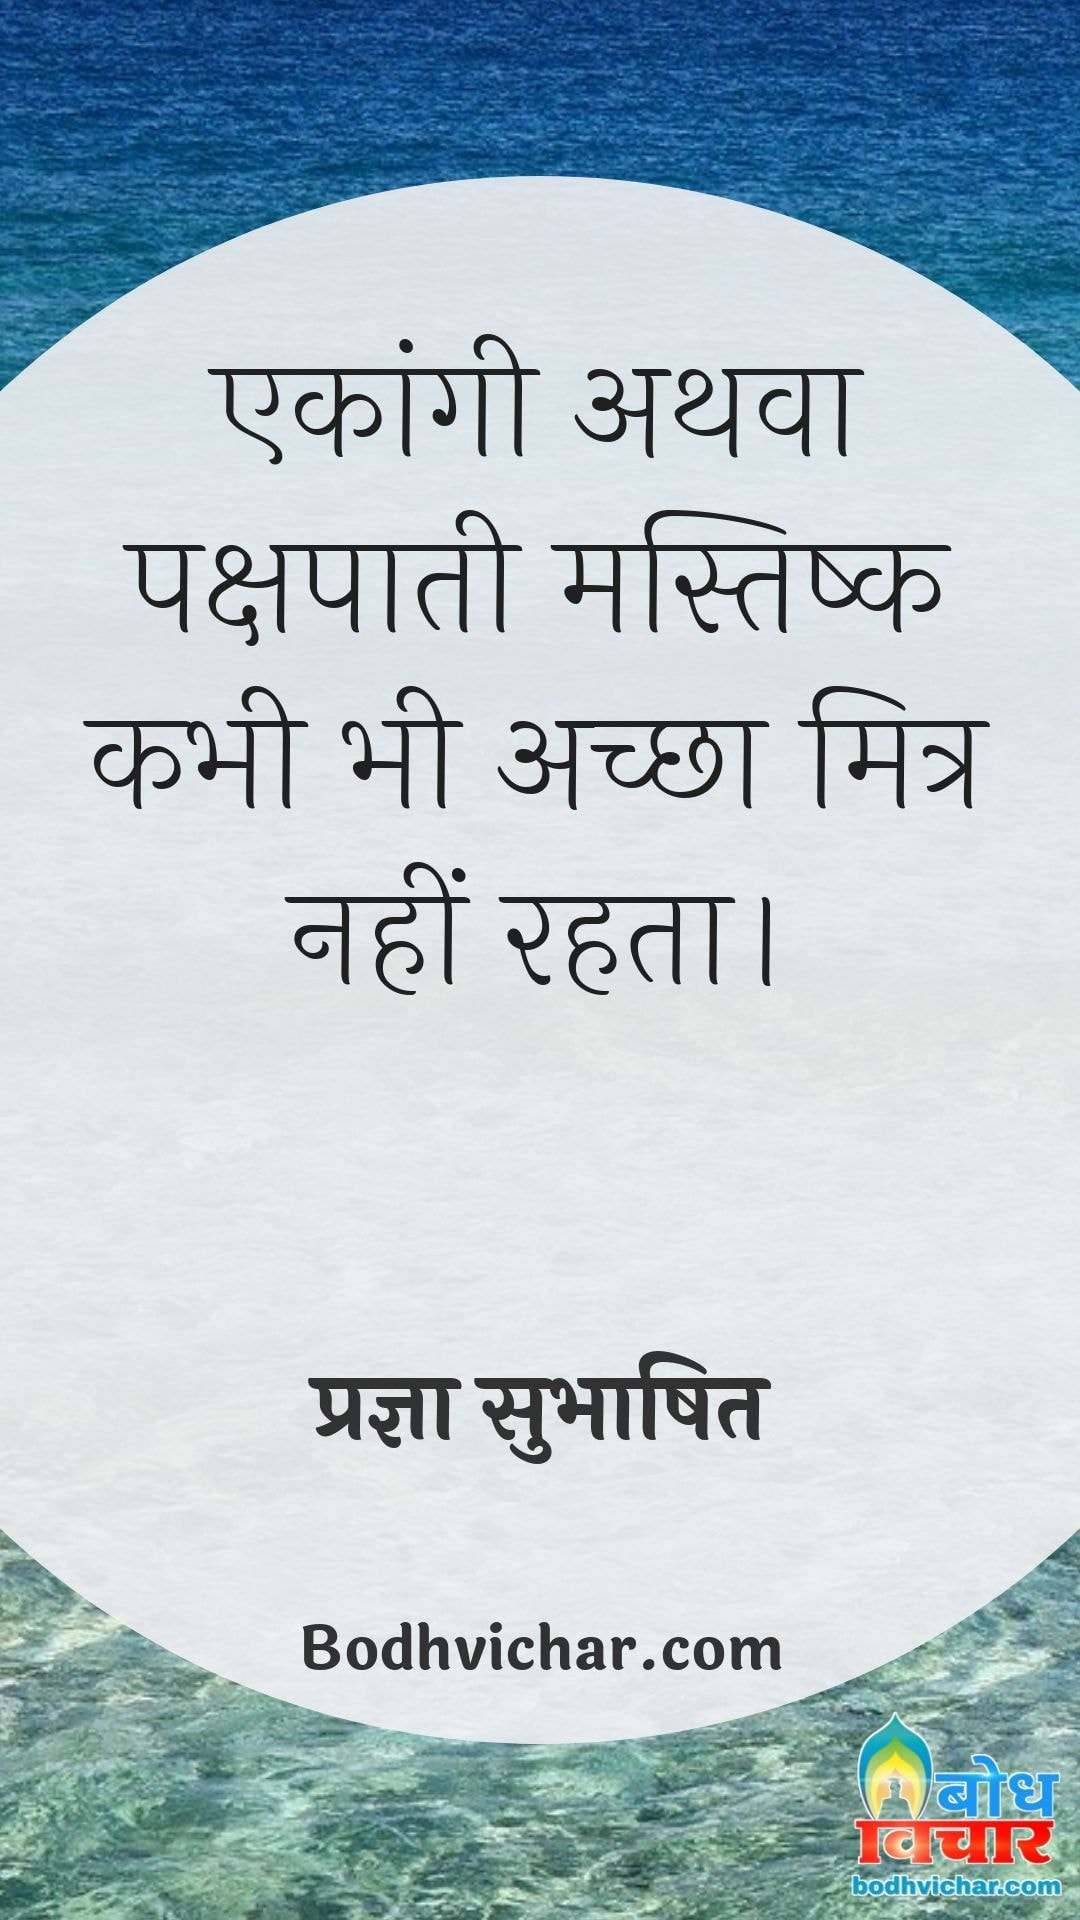 एकांगी अथवा पक्षपाती मस्तिष्क कभी भी अच्छा मित्र नहीं रहता। : Ekangi athva pakshapaati mastisk kabhi bhi achcha mitra nahi rakh sakta - प्रज्ञा सुभाषित